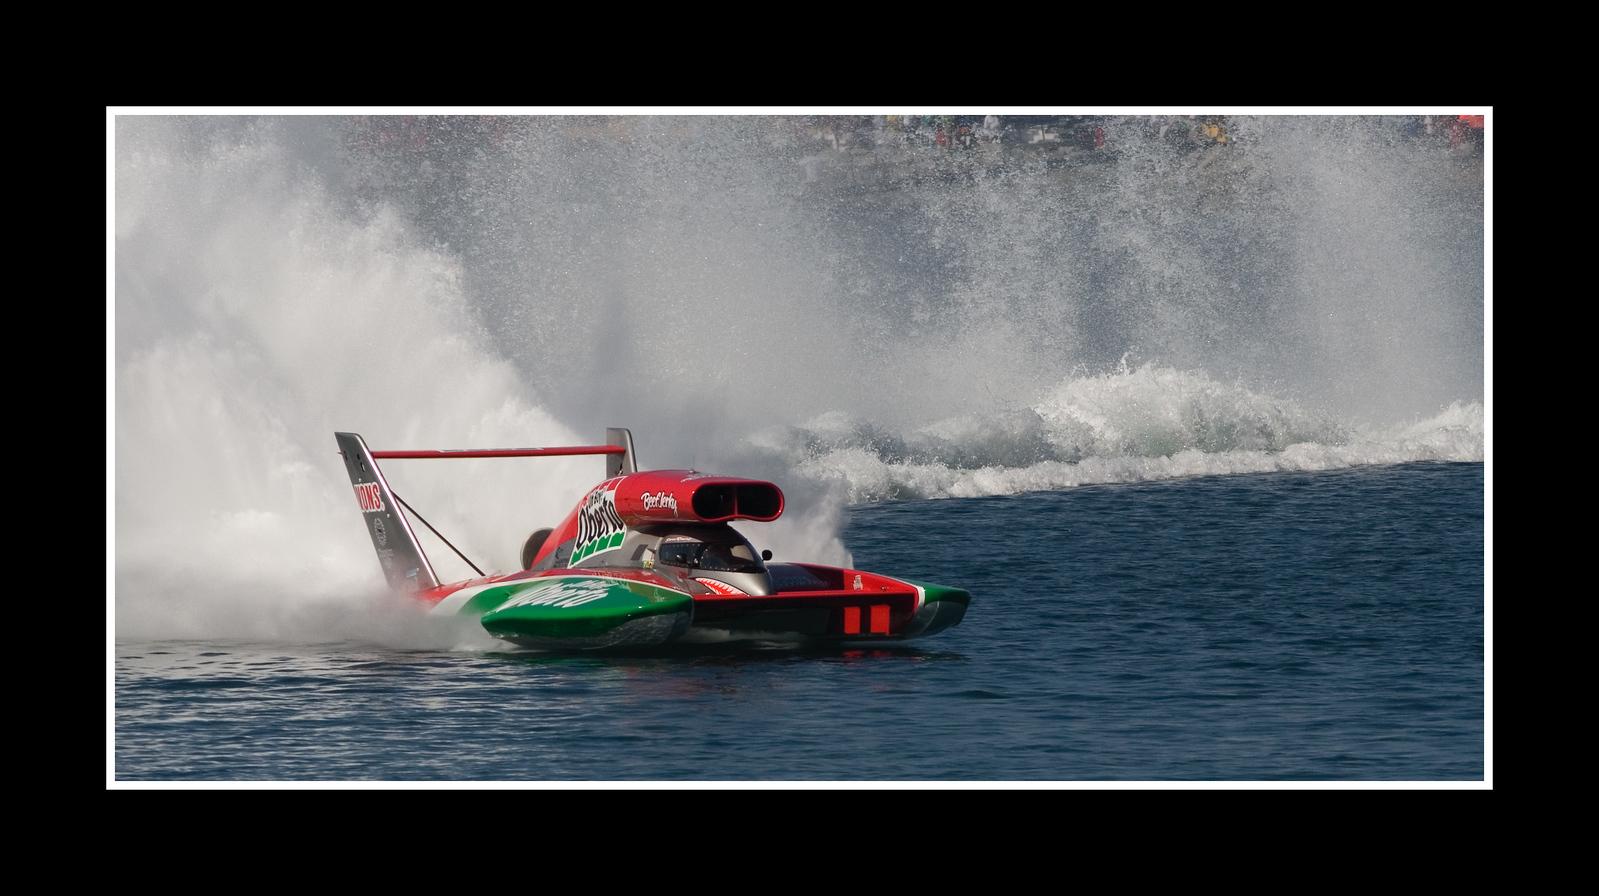 IMAGE: https://photos.smugmug.com/Sports/THUNDERBOAT-REGATTA-2007/i-TNTfv7H/0/53dc63da/X3/JPEG%20Thunderboat%200585-X3.jpg